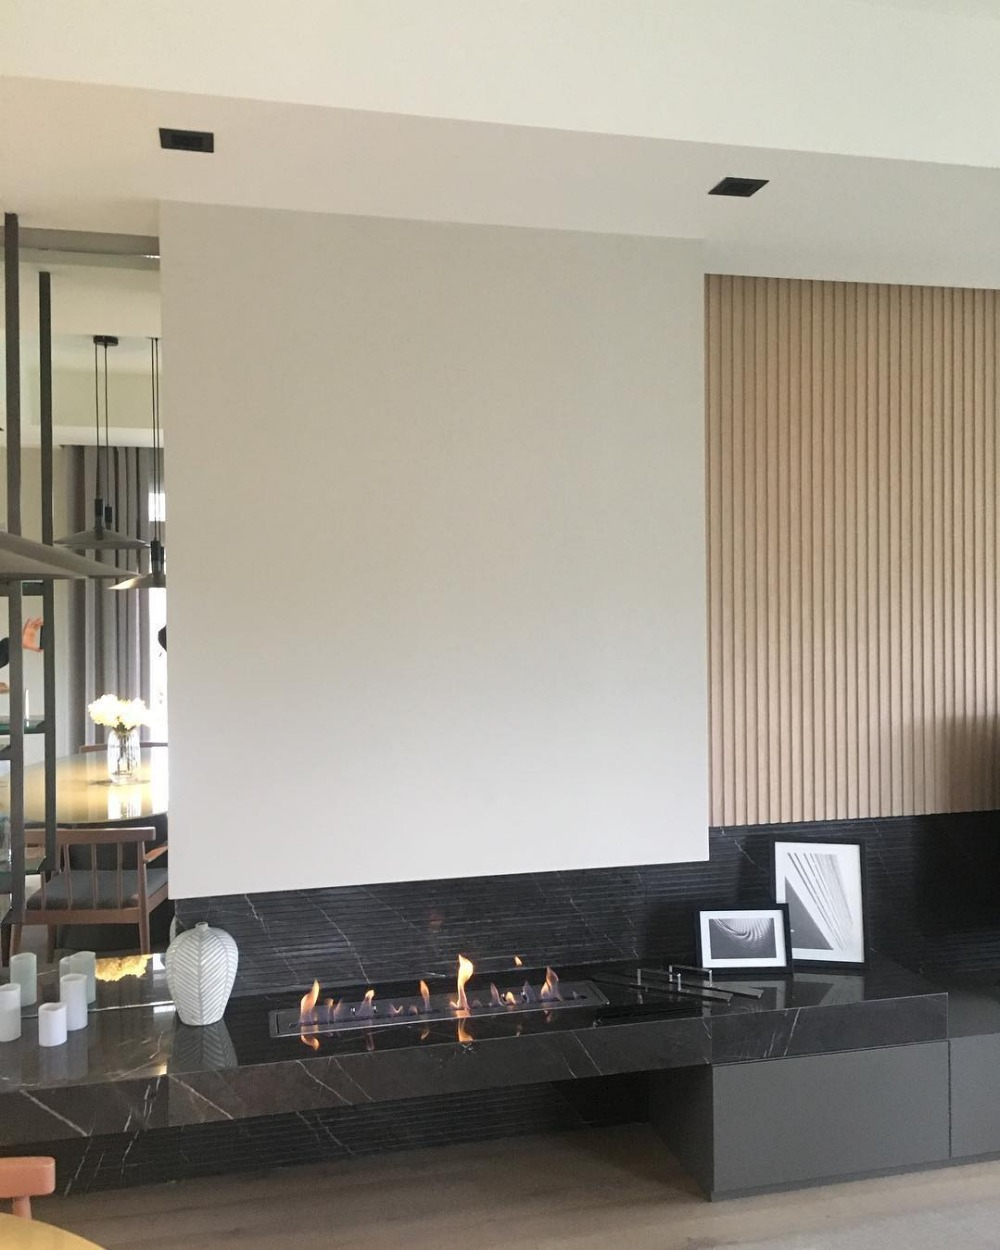 30 Inch Real Fire Indoor Intelligent Smart Automatic Bio Ethanol Burner